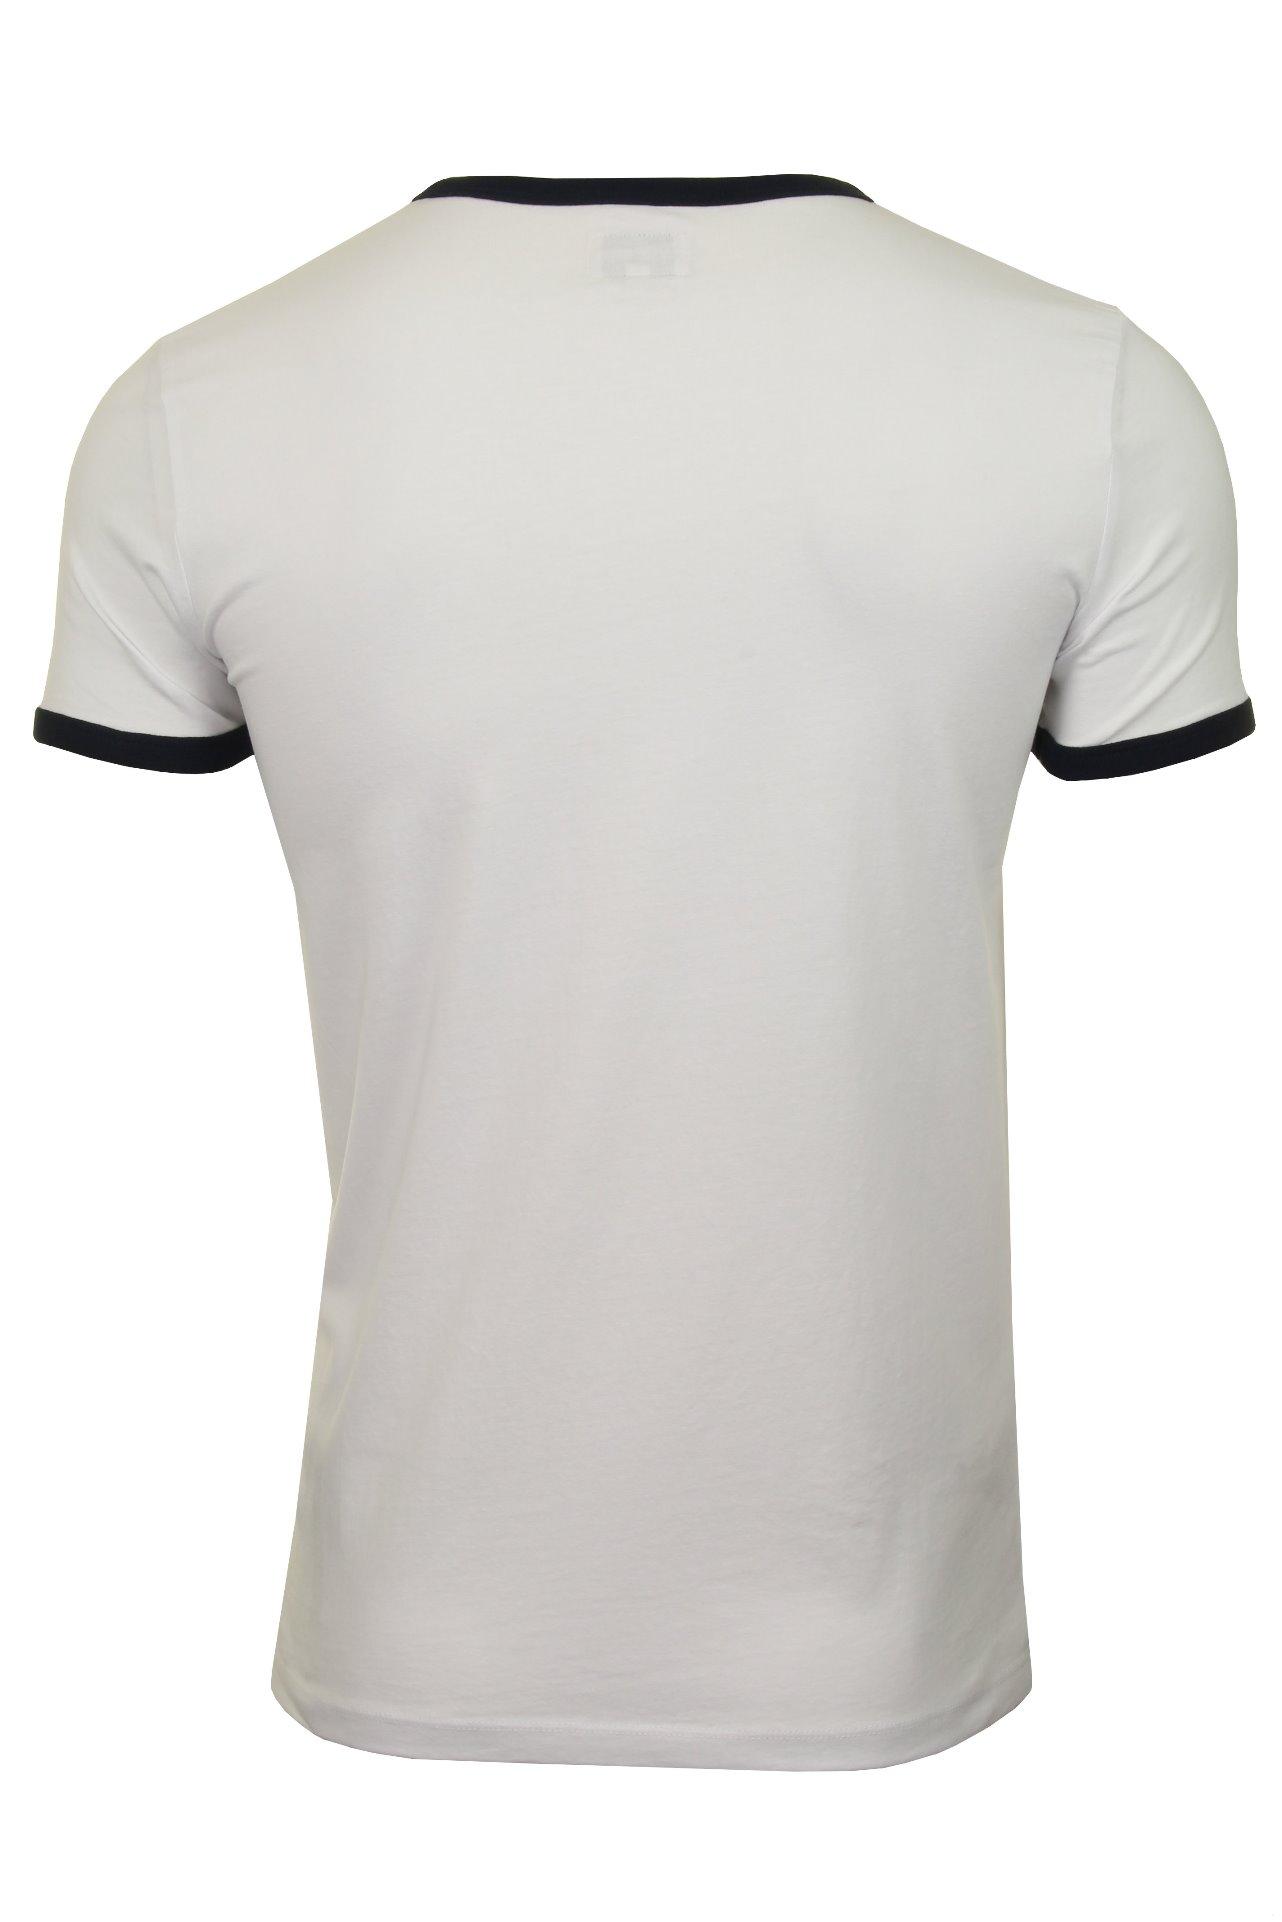 WRANGLER-034-Kabel-Tee-039-T-shirt-a-manches-courtes miniature 8